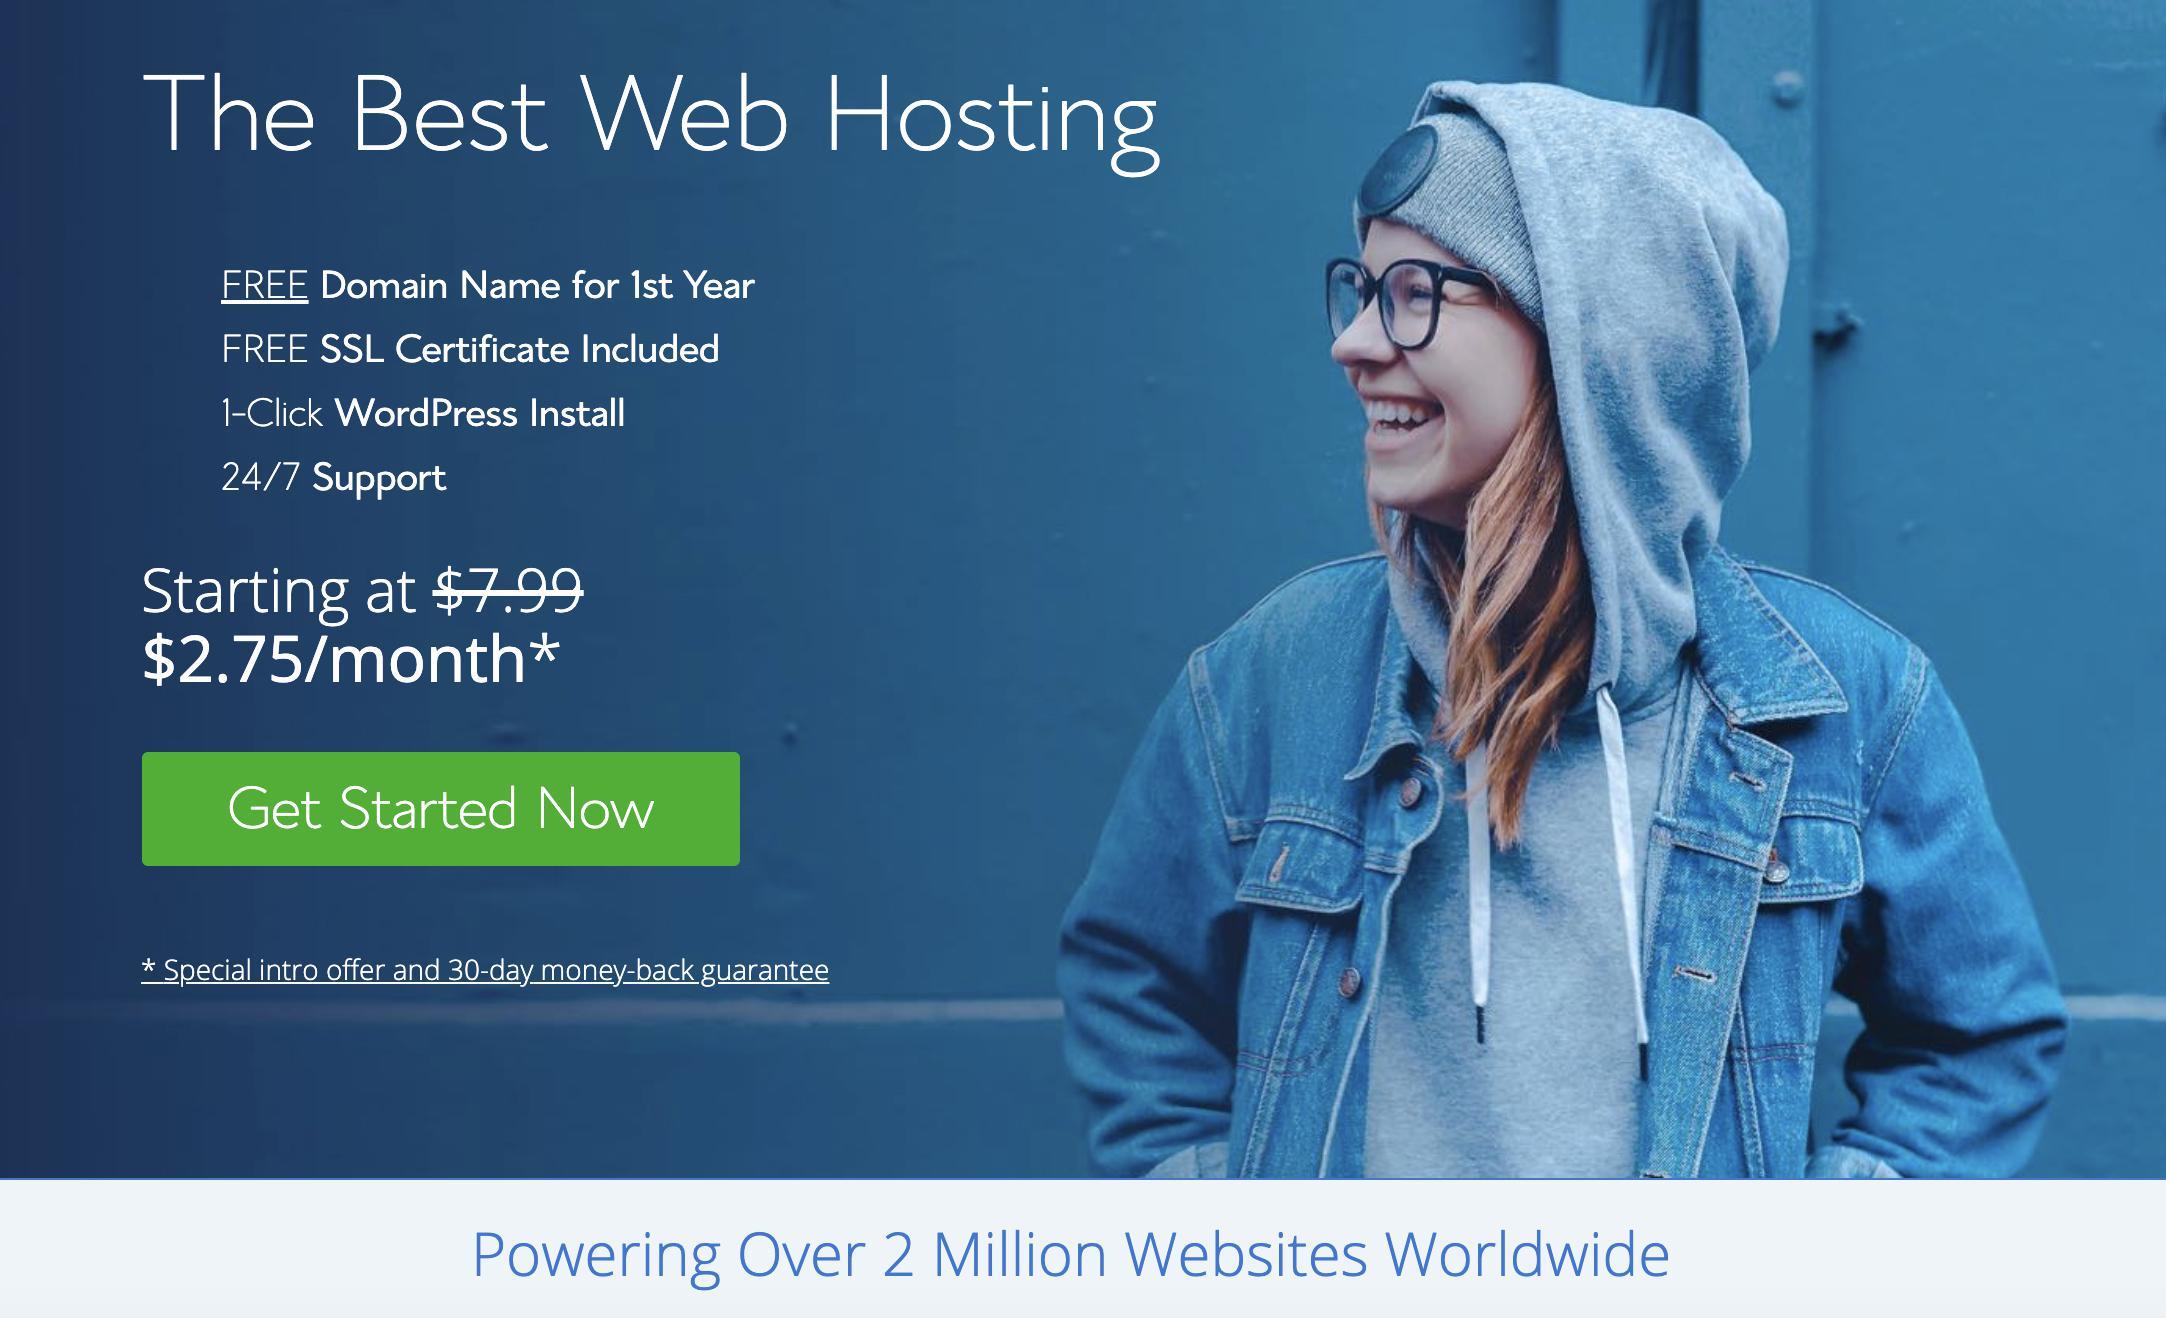 Перенести блог с Wix на WordPress - Пошаговое руководство 2020